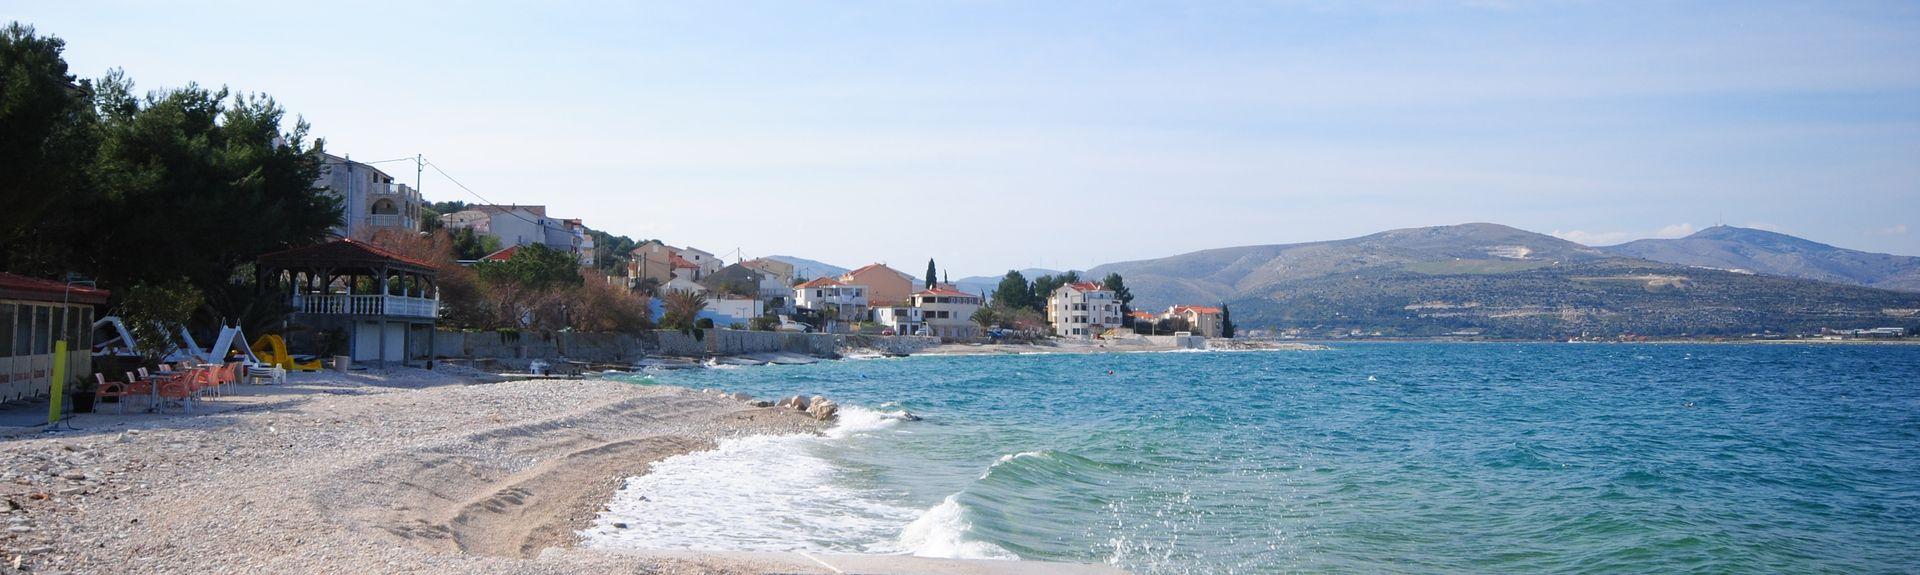 Kaštel Gomilica, Gespanschaft Split-Dalmatien, Kroatien